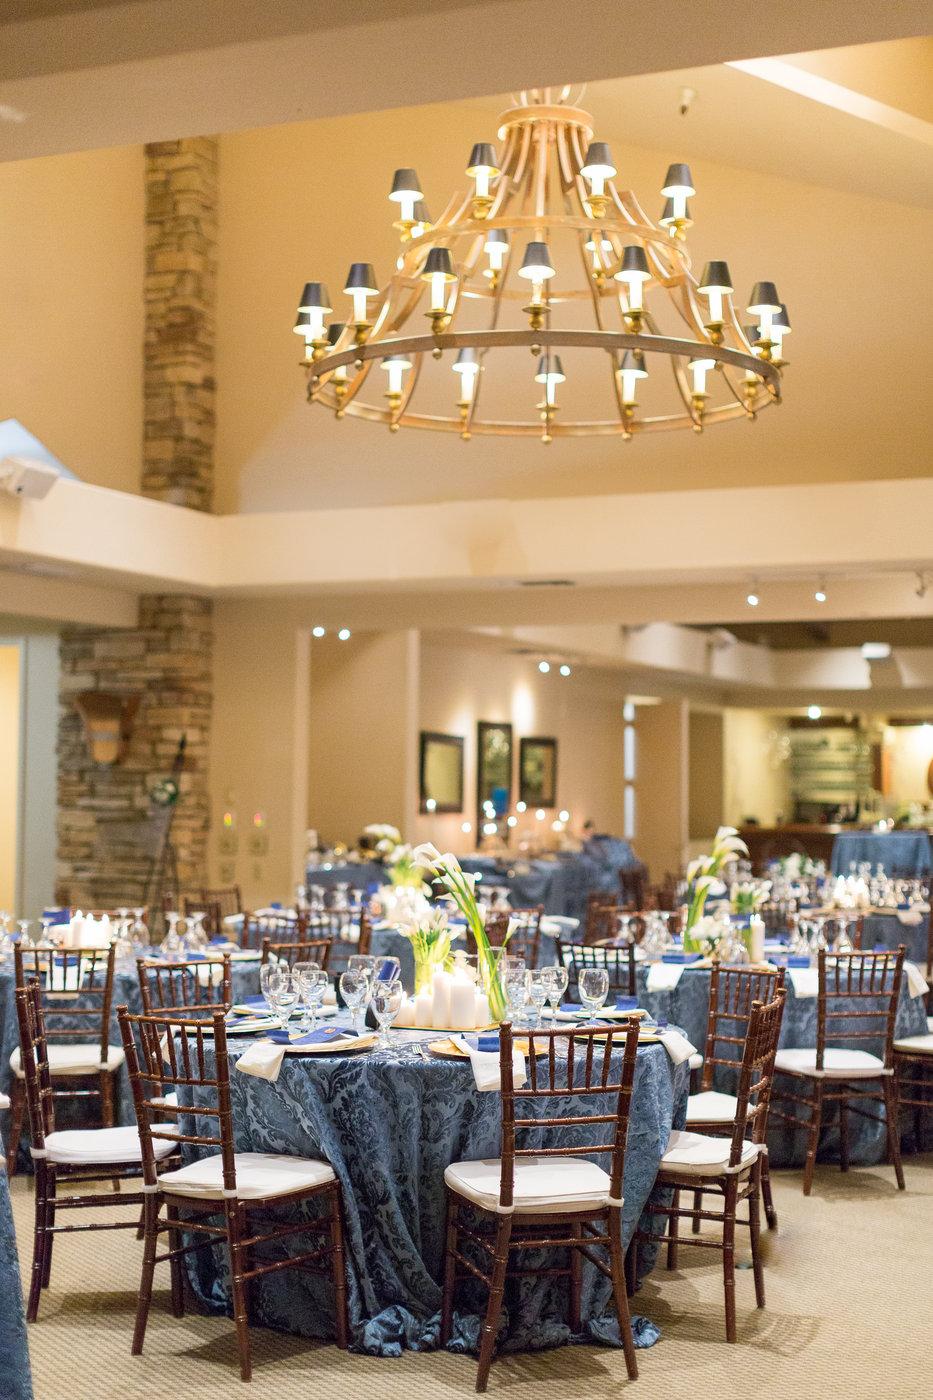 indoor-wedding-winter-reception-in-chico-californiajpg